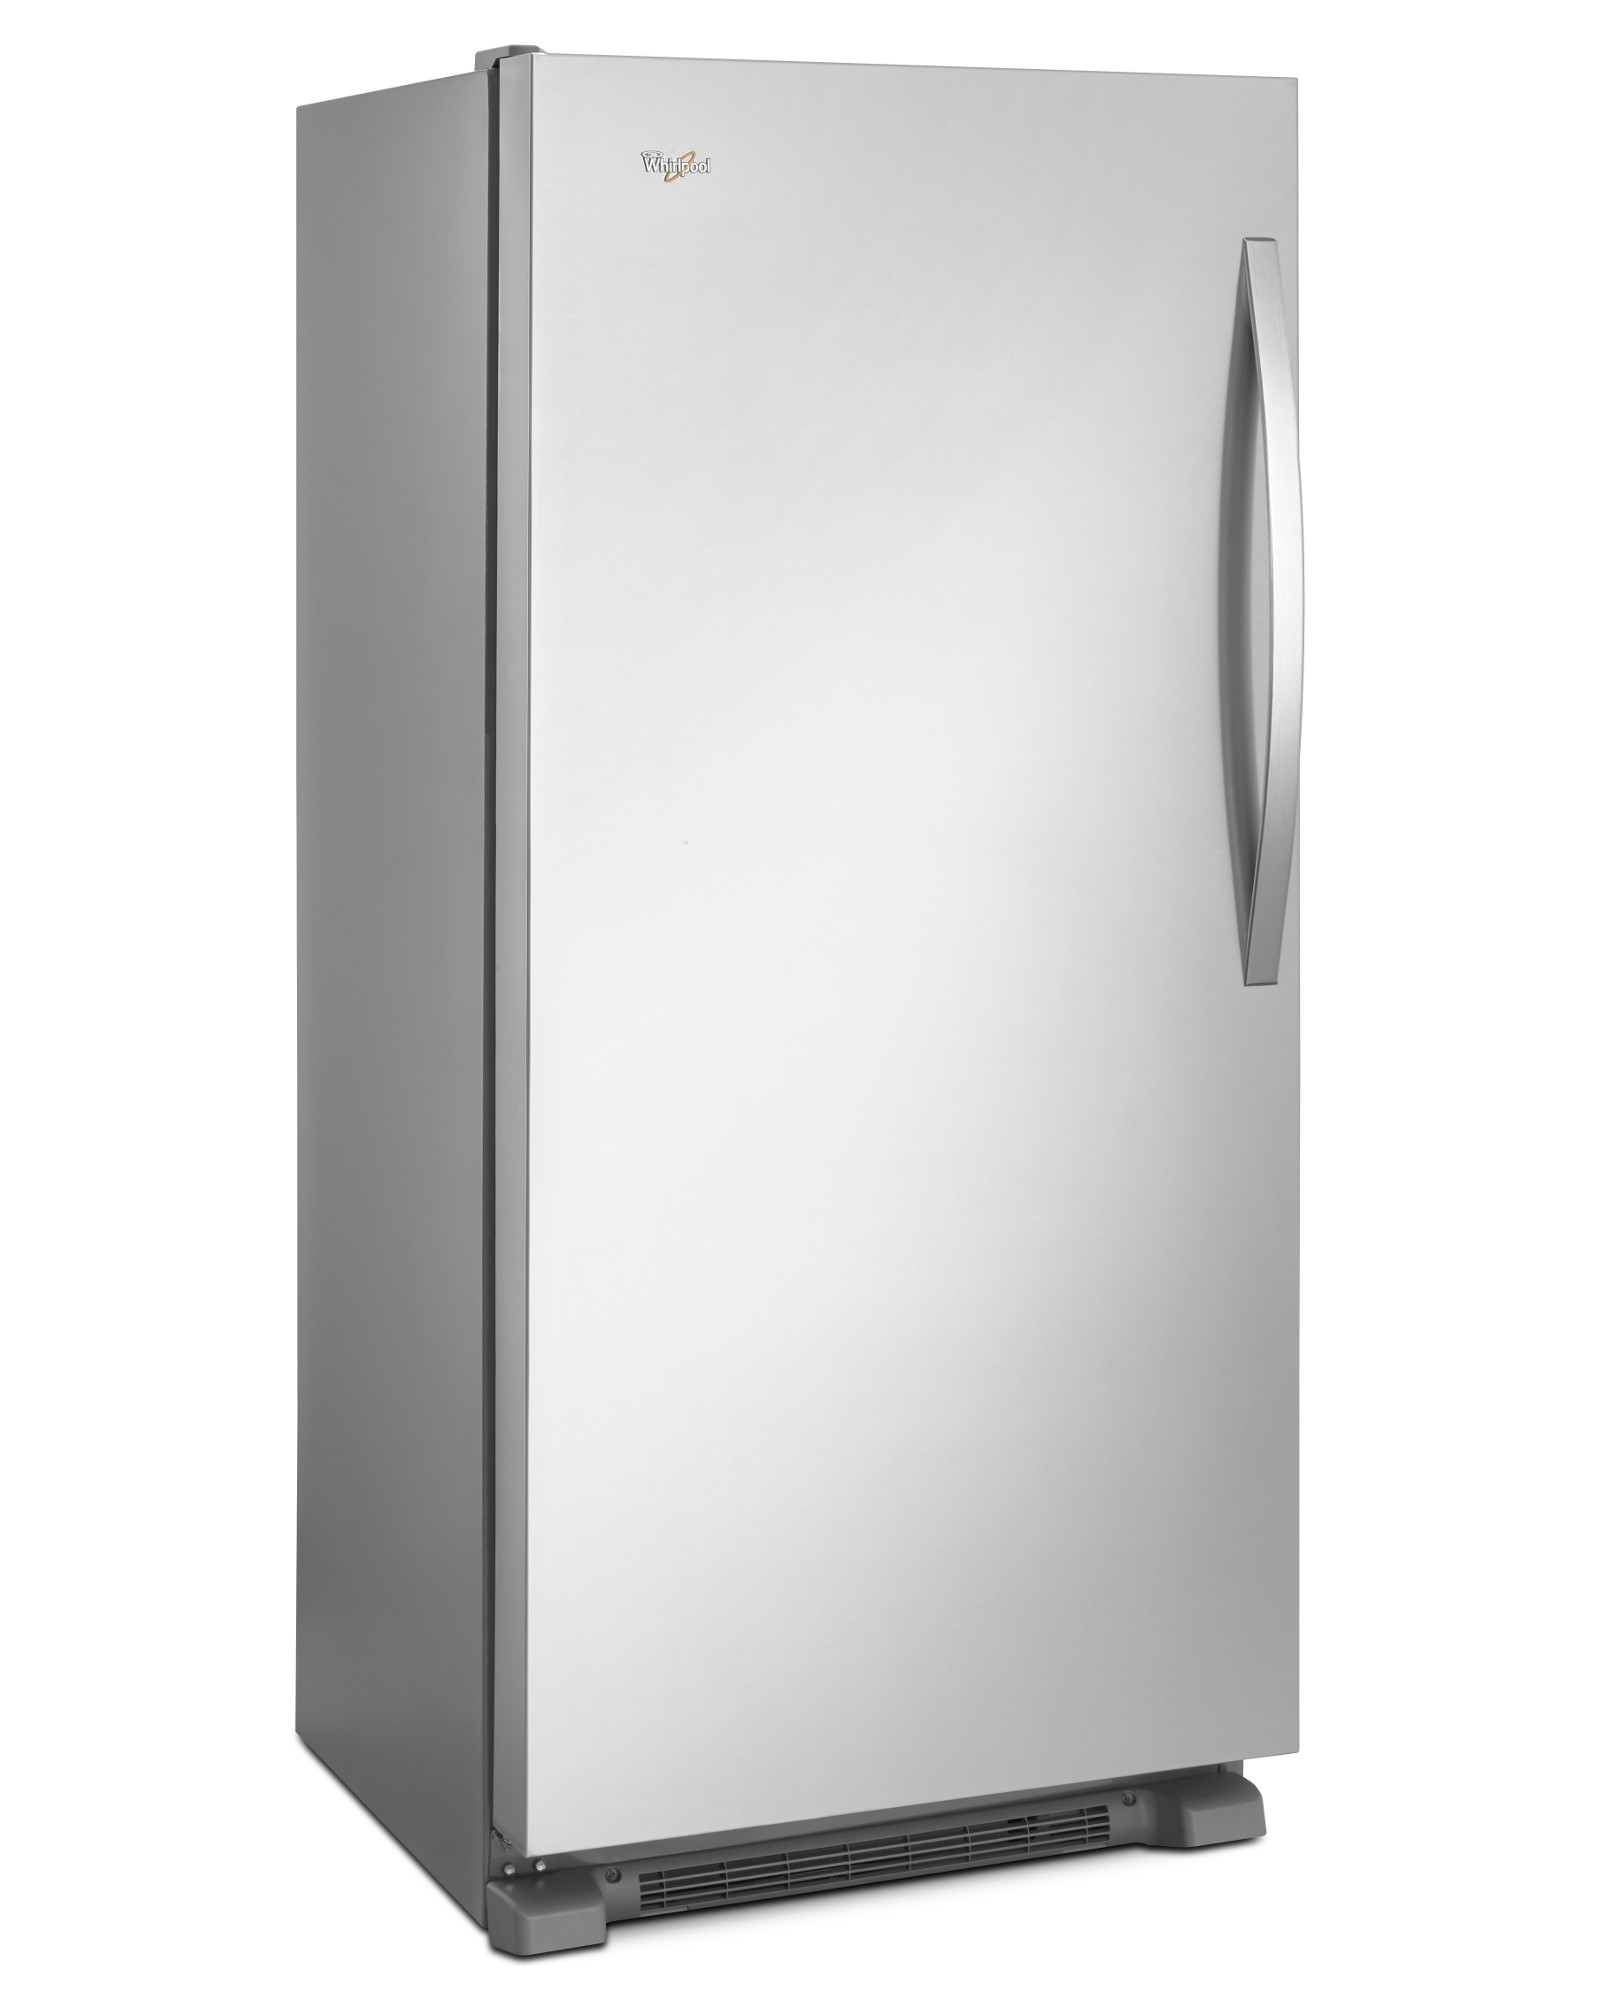 Whirlpool WSZ57L18DM 18 cu. ft. SideKicks® Upright Freezer - Stainless Steel